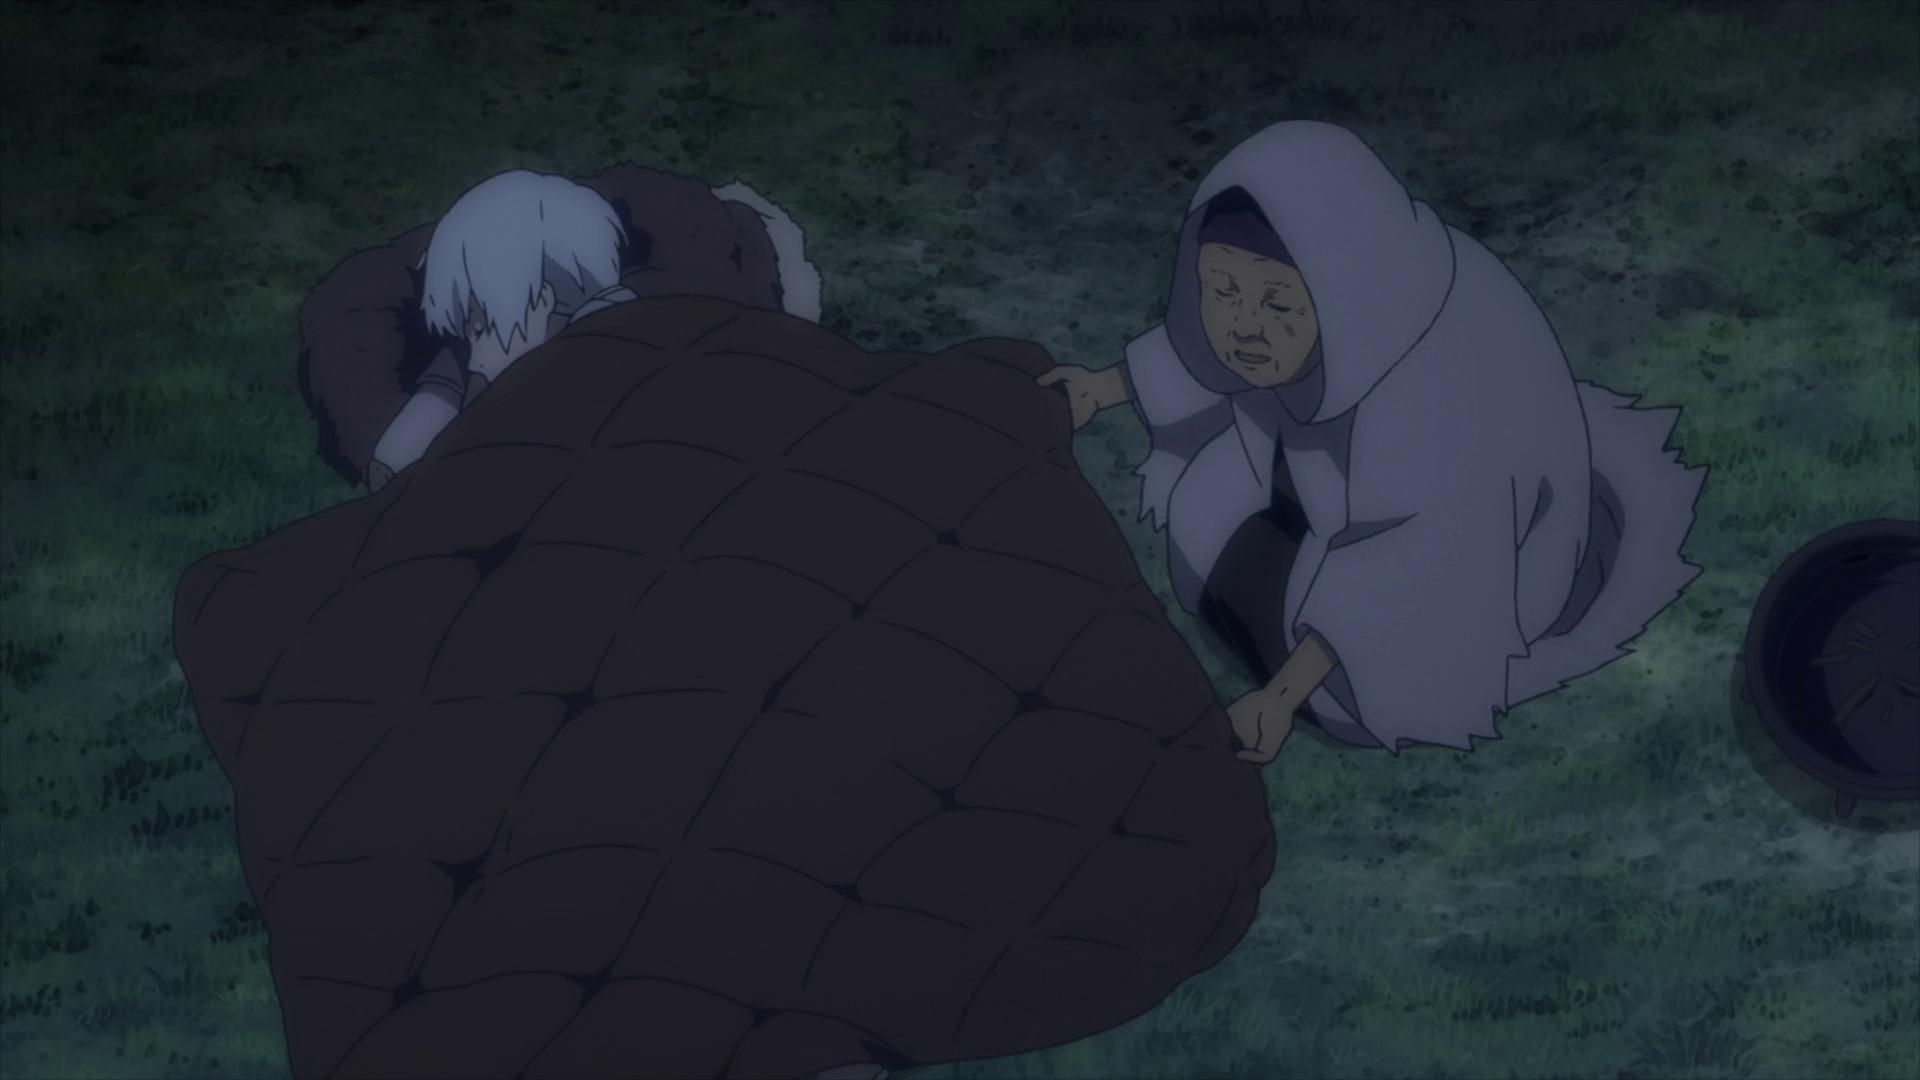 Fushi and Pioran